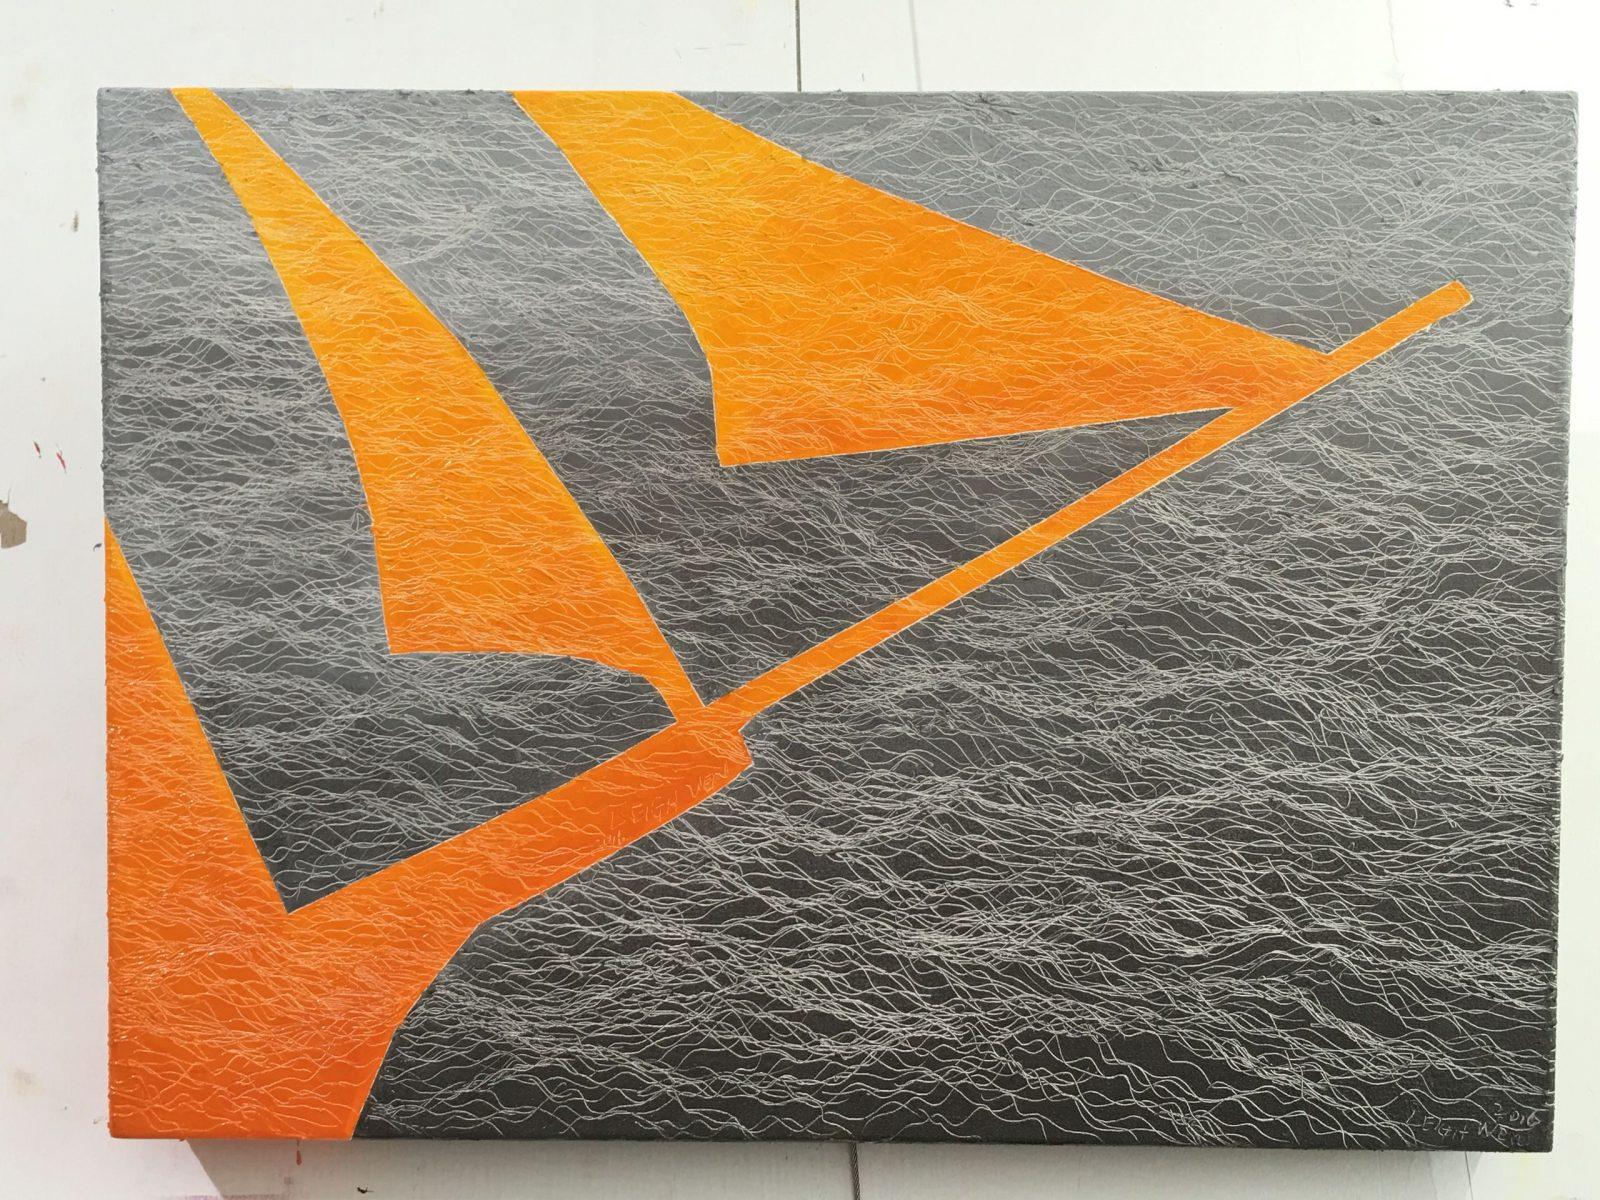 帆行 5, Sail 5, 33 x 45 cm (8P), oil on linen, 2016